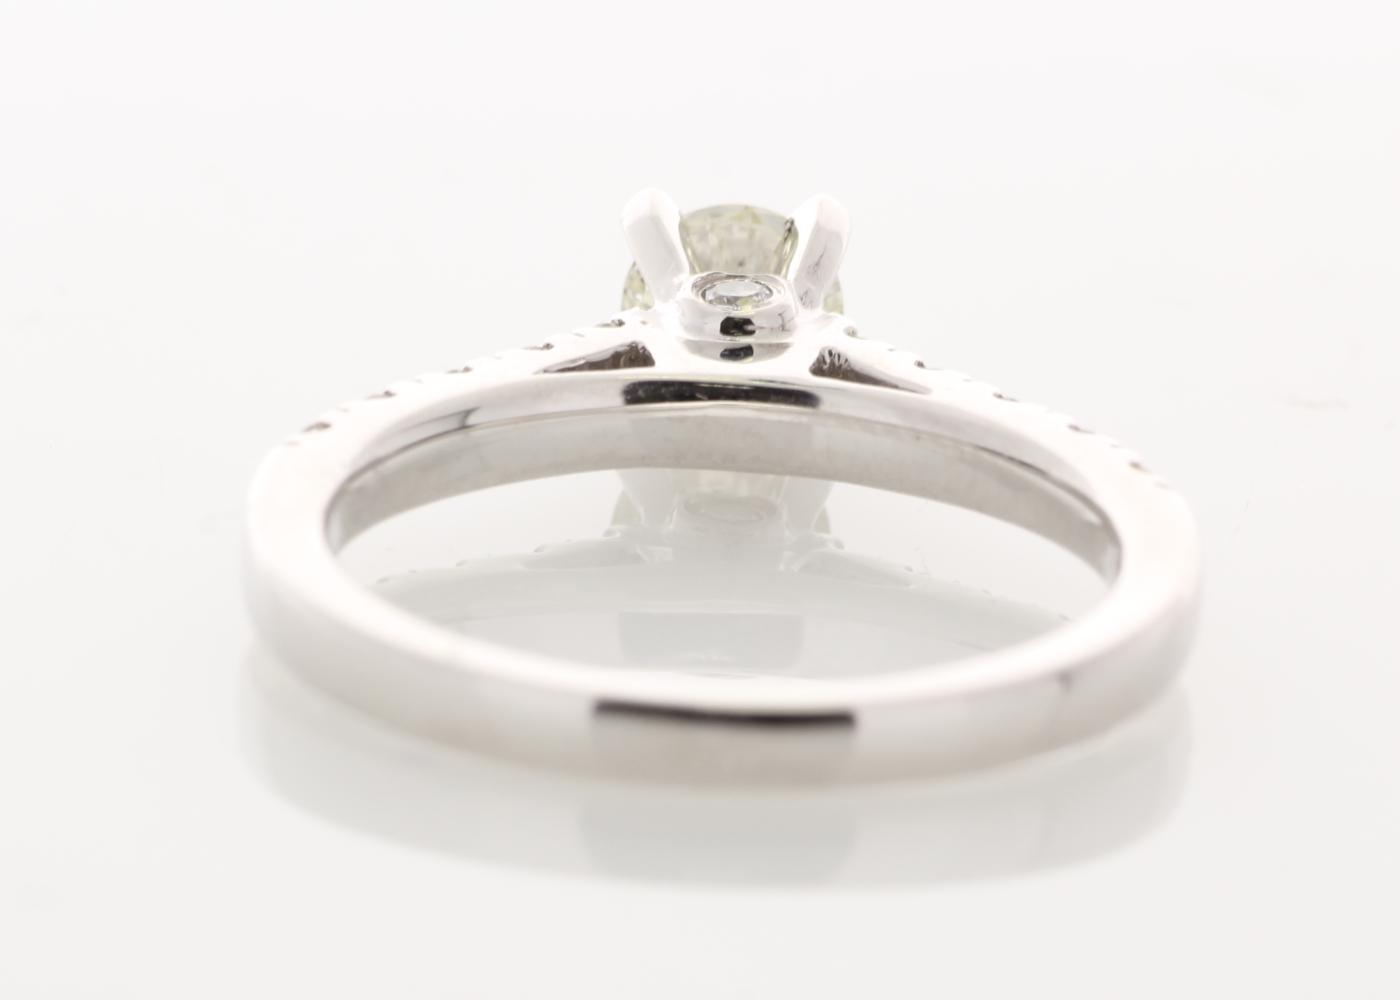 18k White Gold Stone Set Shoulders Diamond Ring 0.91 Carats - Image 4 of 5